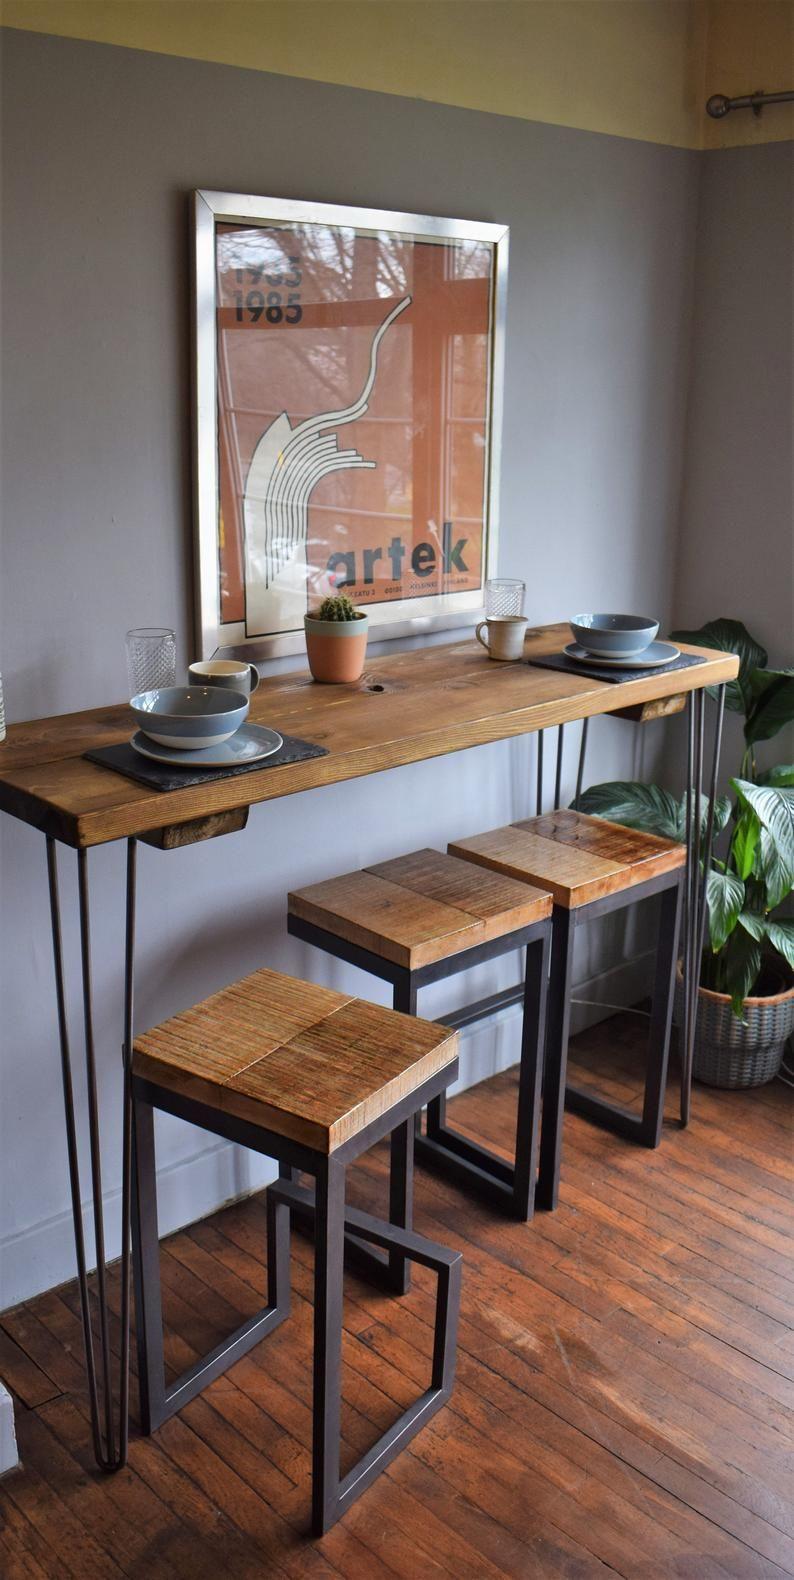 Tall Reclaimed Wood Industrial Hairpin Legs Kitchen Breakfast Etsy Kitchen Bar Table Breakfast Bar Kitchen Kitchen Breakfast Bar Stools